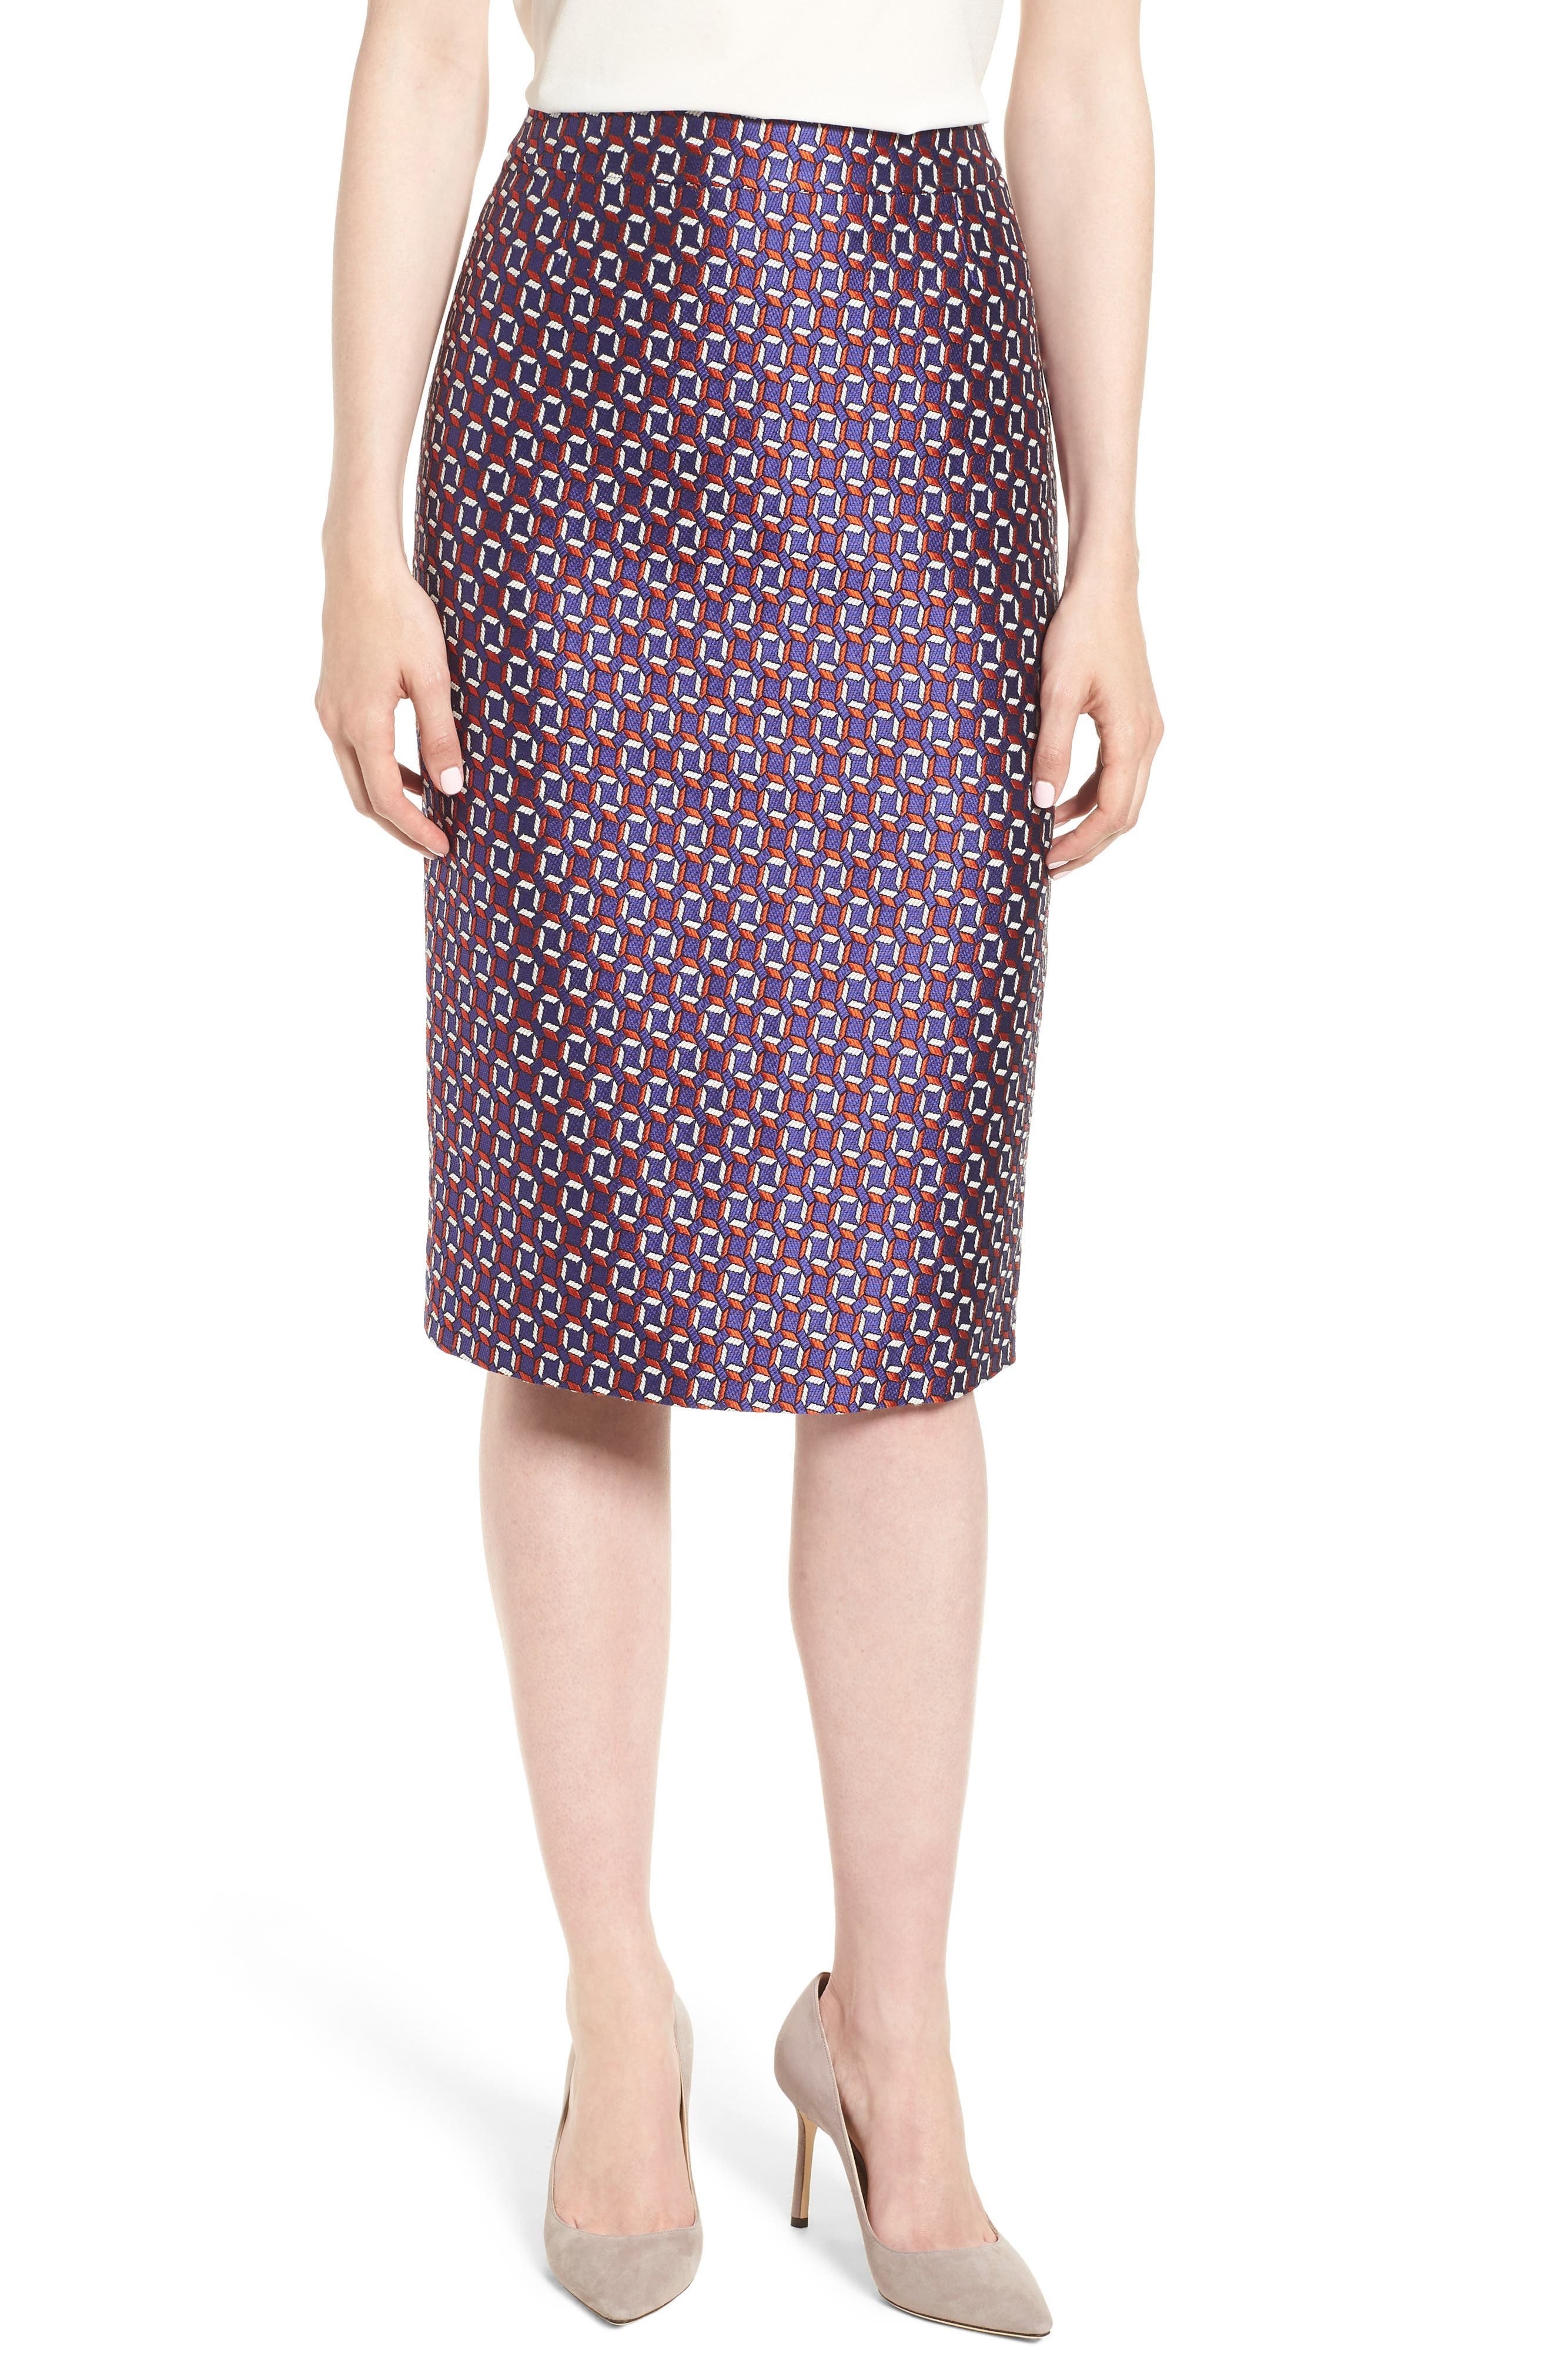 Varines Jacquard Pencil Skirt,                             Main thumbnail 1, color,                             575